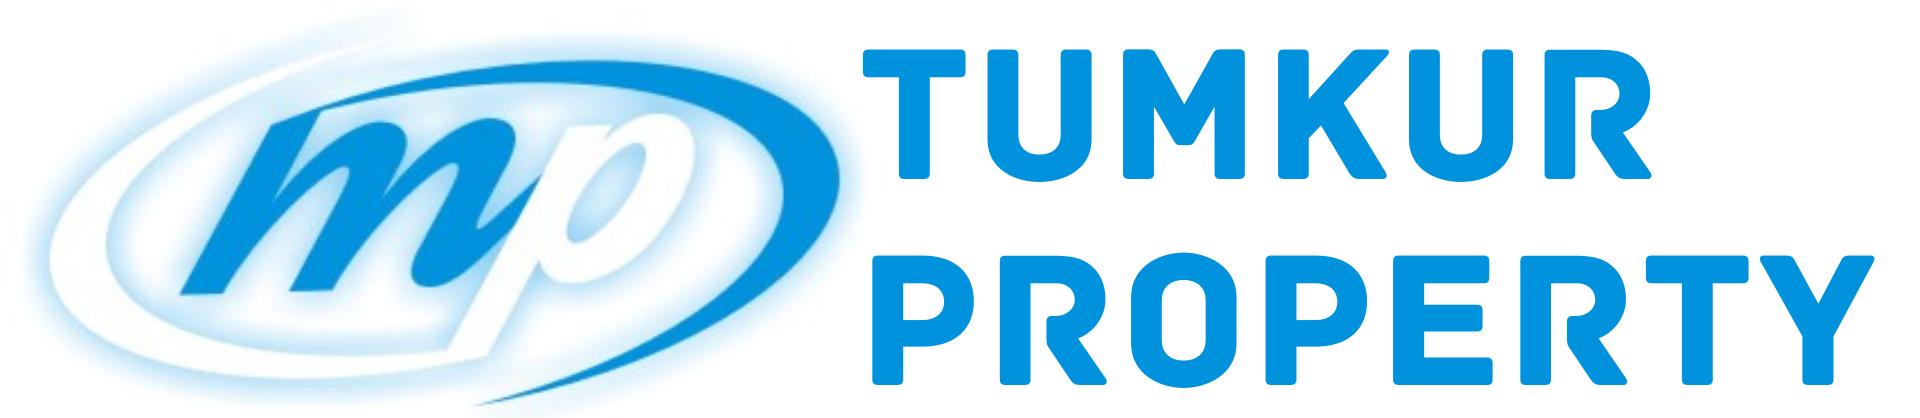 Tumkur Property